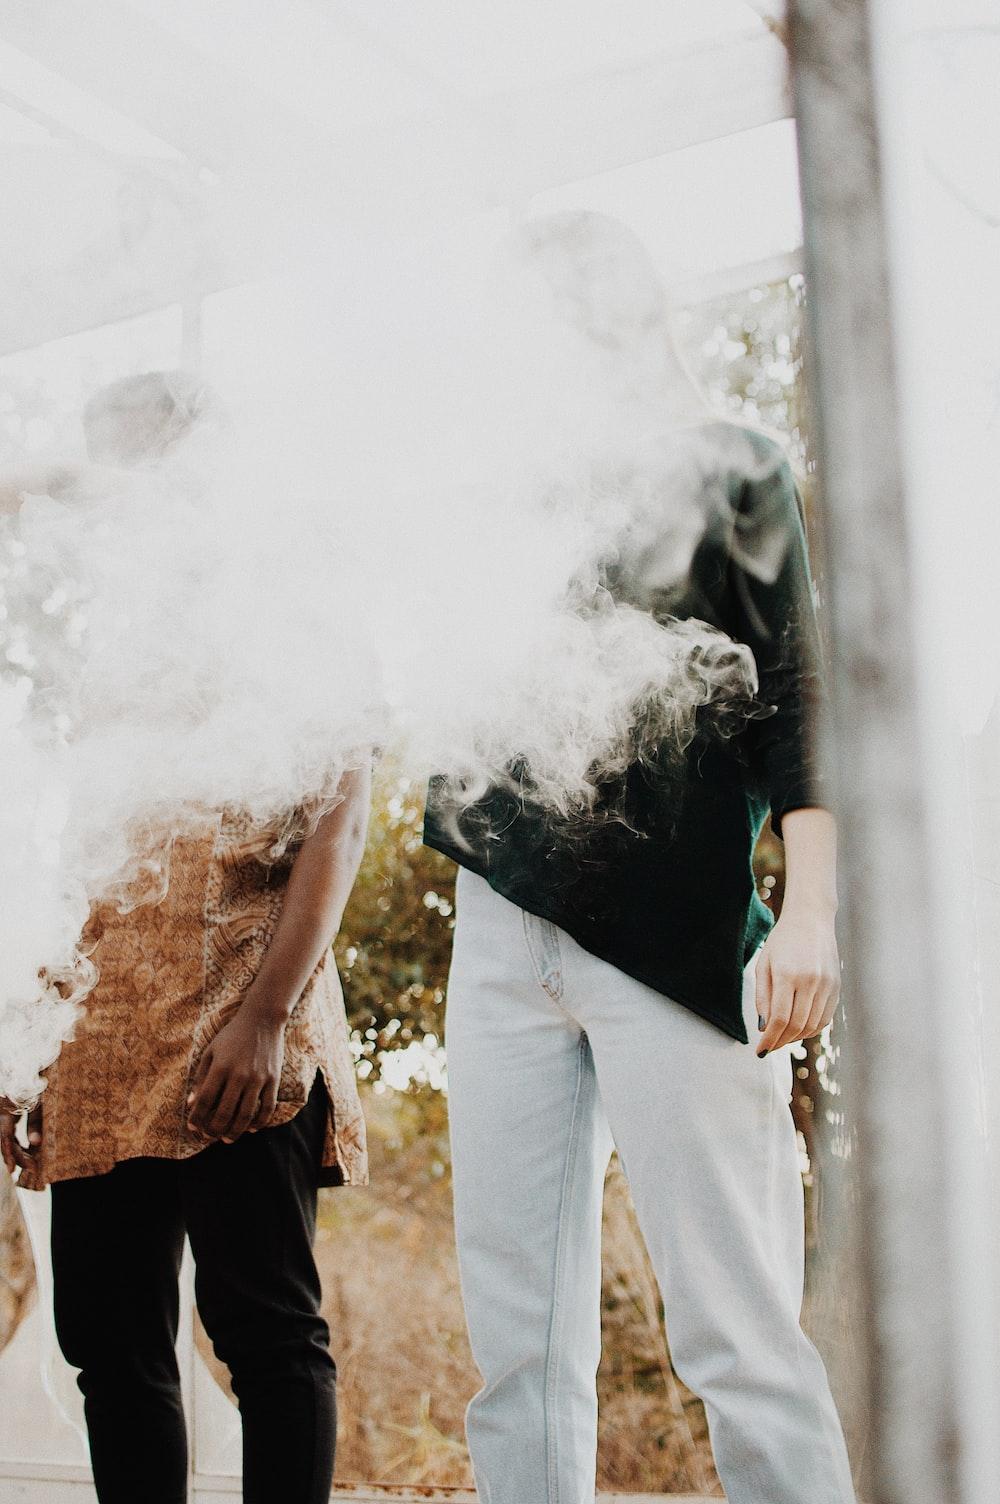 man standing with smoke